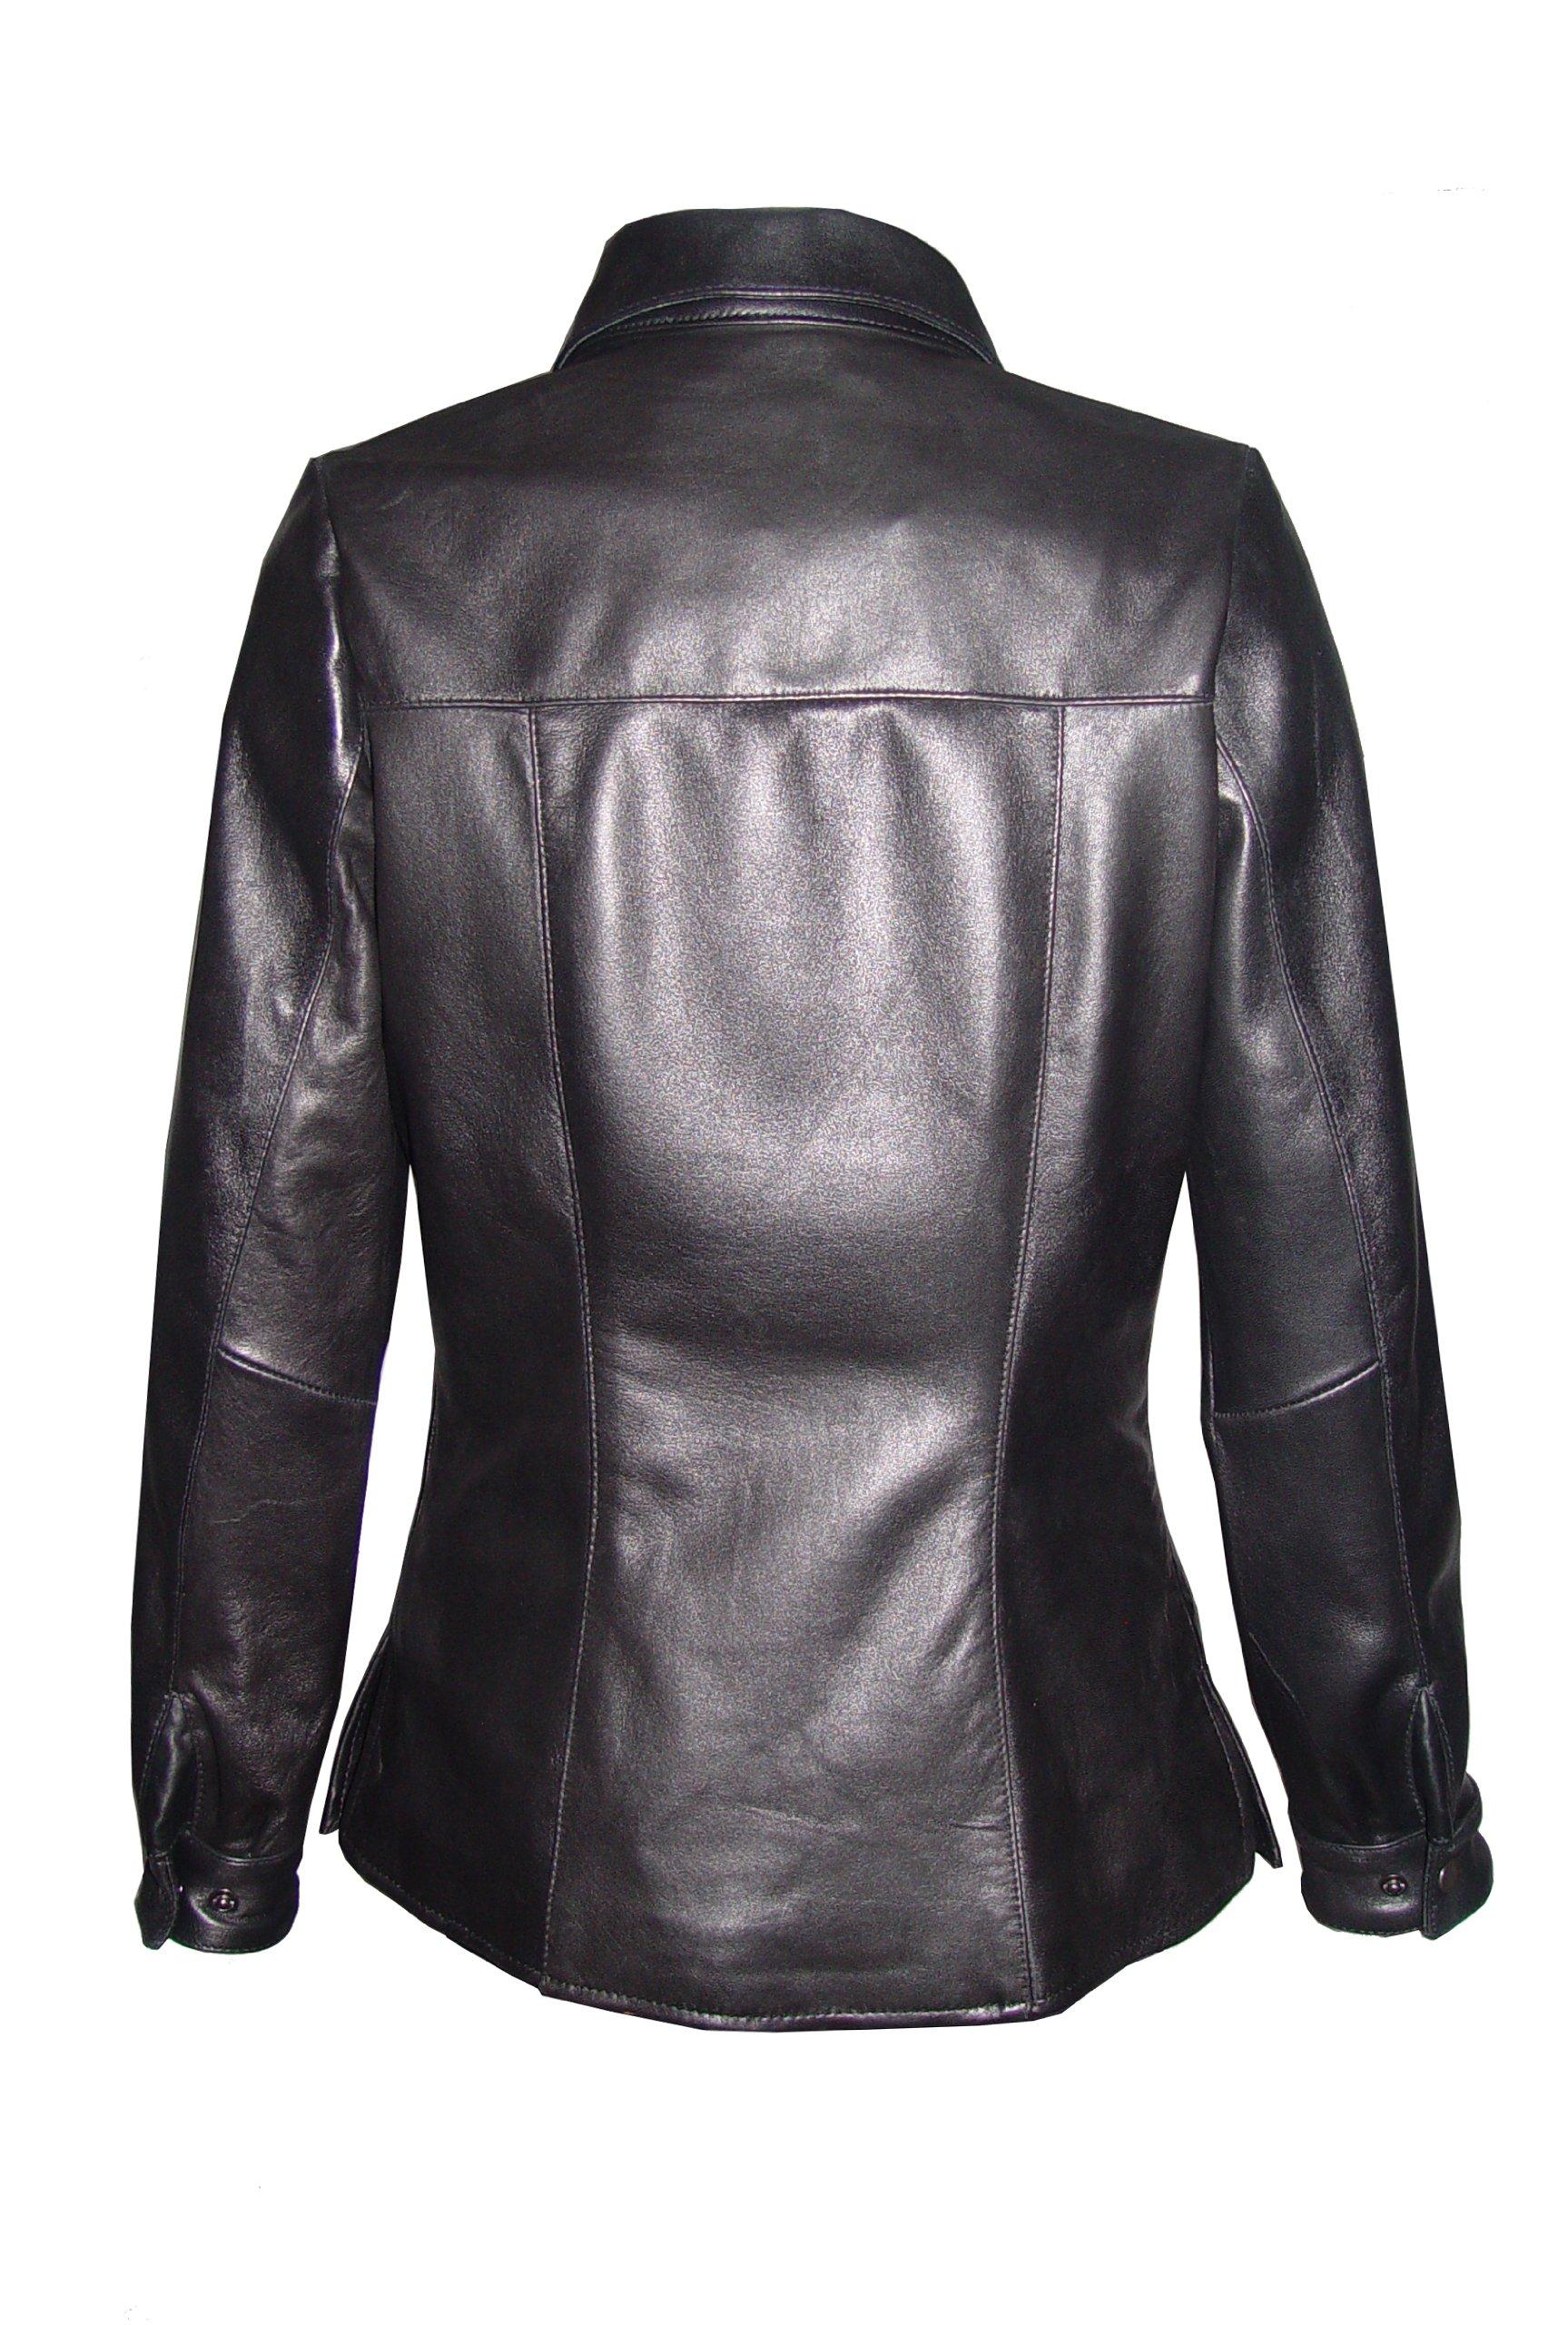 Nettailor 4081 Clean New Lambskin Genuine Leather Shirt Jacket Fine Soft Lamb by NETTAILOR (Image #3)